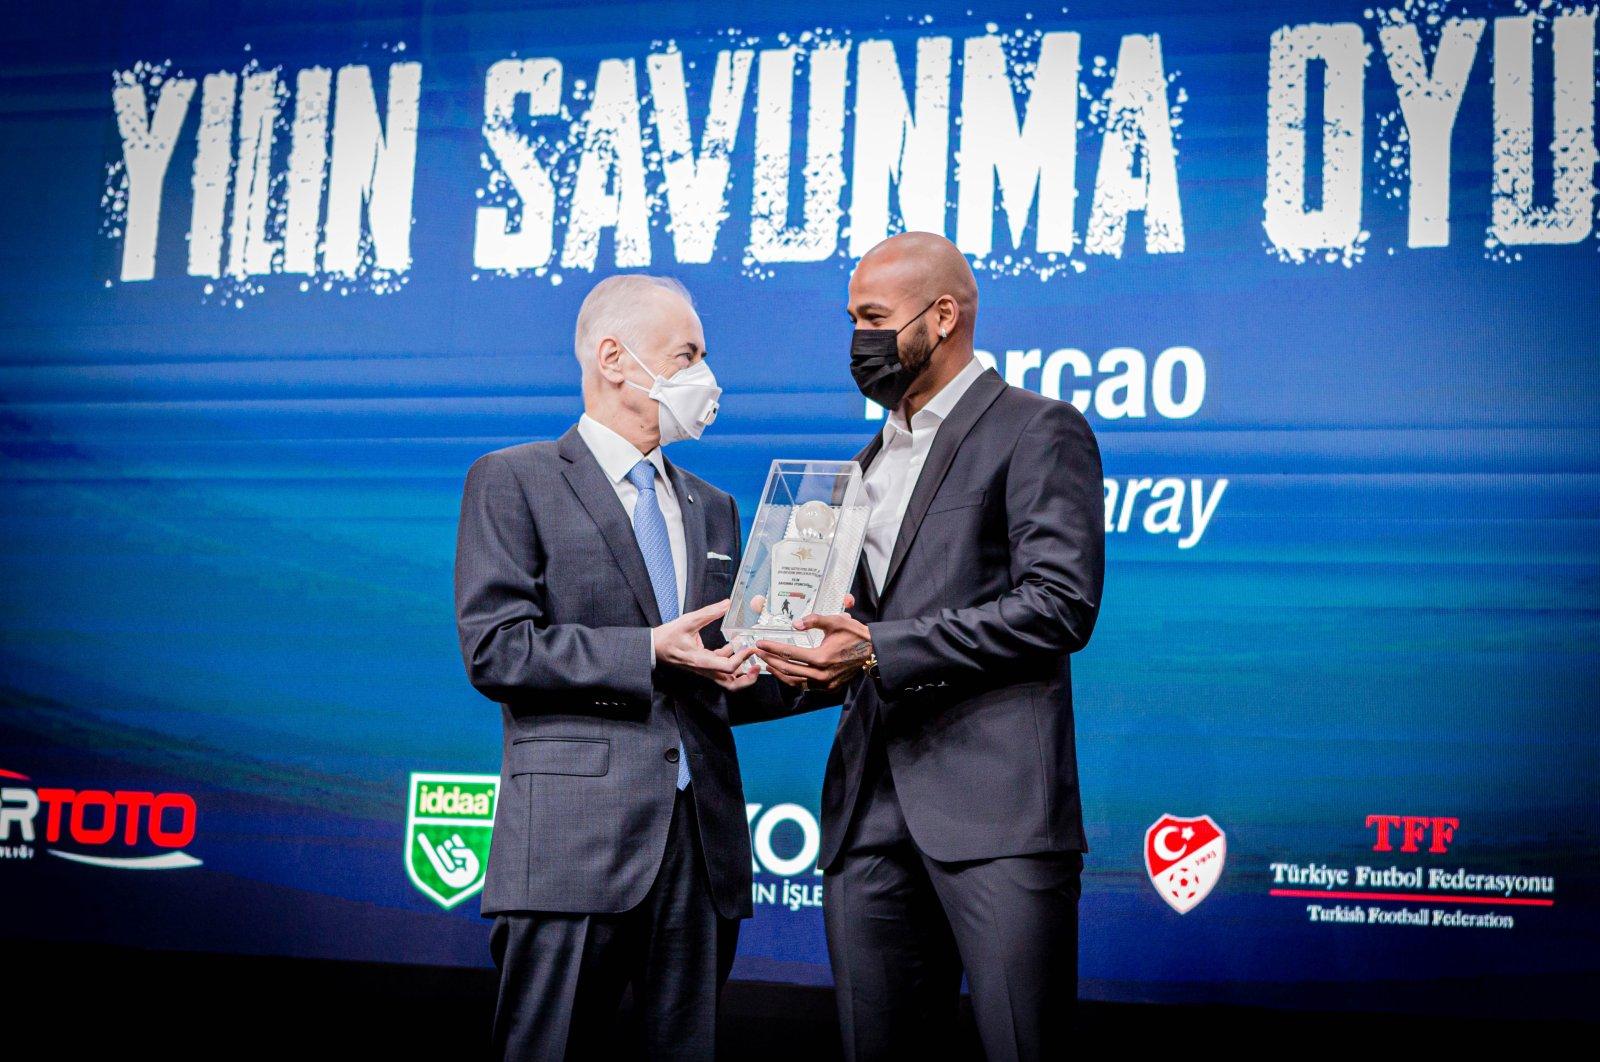 Galatasaray chairperson Mustafa Cengiz gives an award to Galatasaray defender Marcao, in Istanbul, Turkey, Dec. 3, 2020. (Photo by Hatice Çınar)